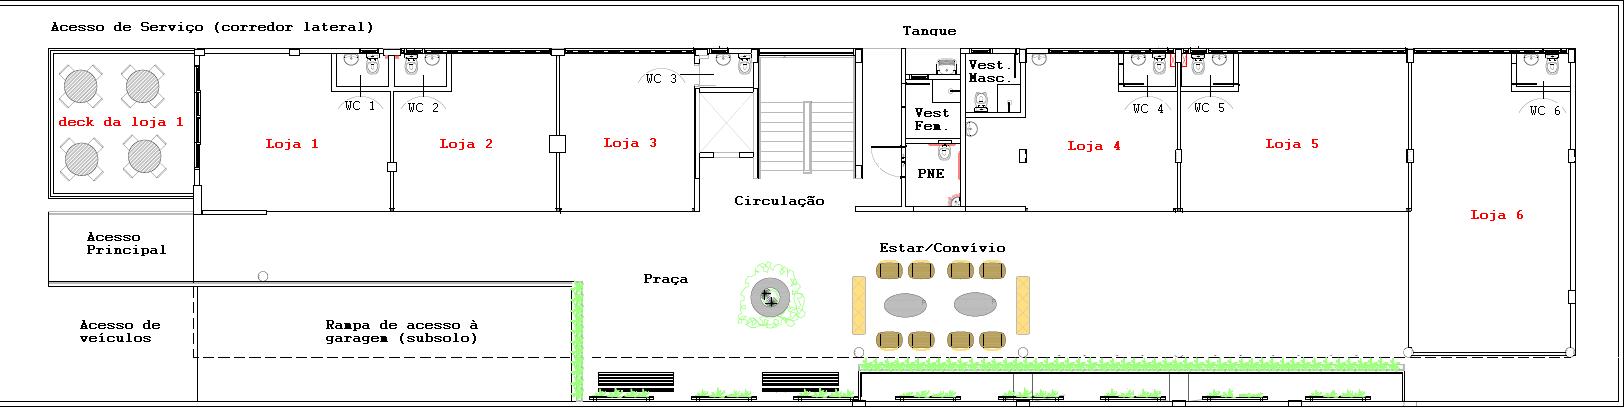 Planta baixa piso térreo - Editada (10-3